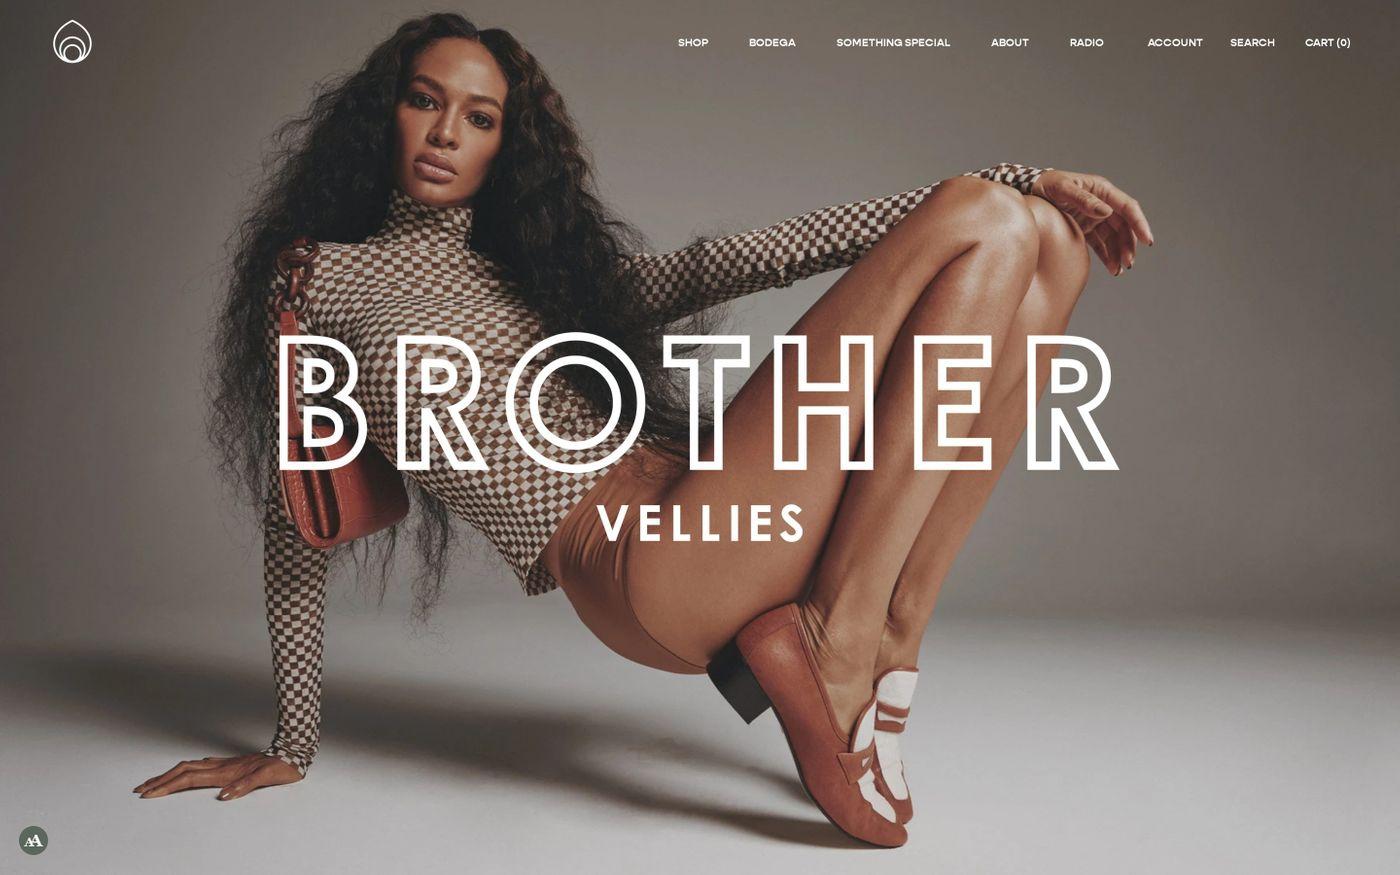 Screenshot of Brother Vellies website